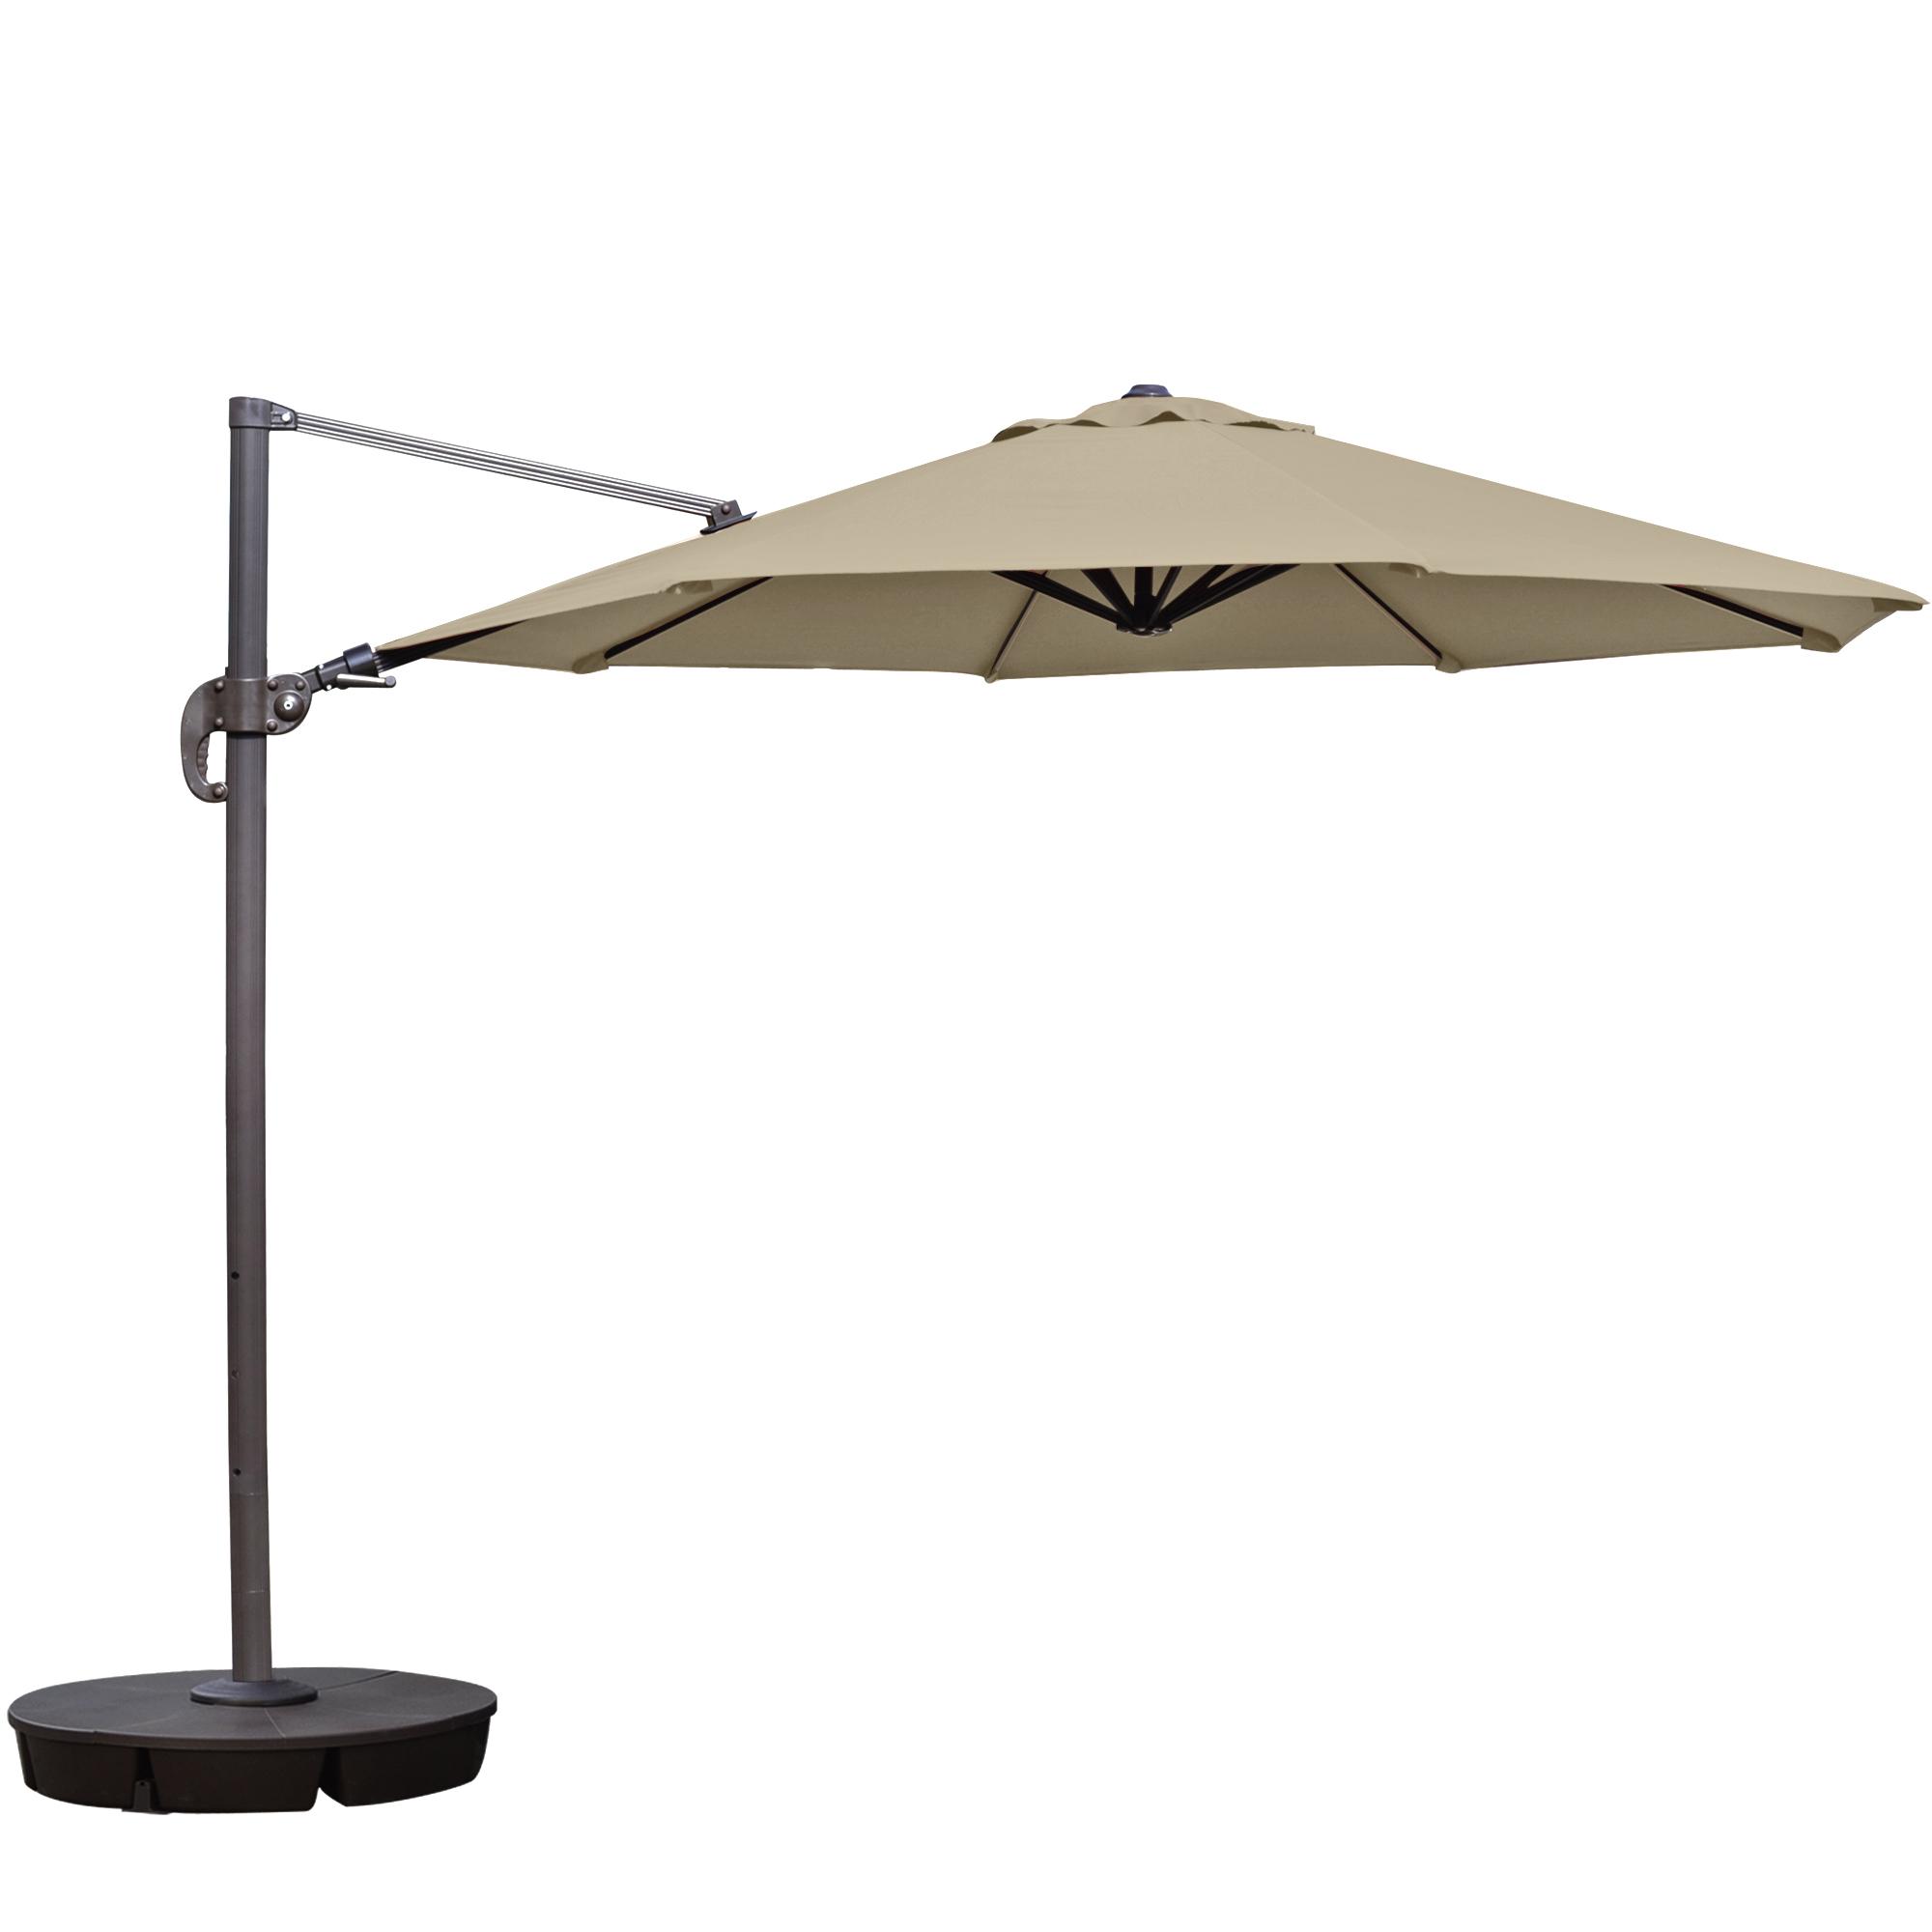 Home Grill Patio Umbrellas Island Umbrella Freeport 11 Ft Octagonal Cantilever In Beige Sunbrella Acrylic